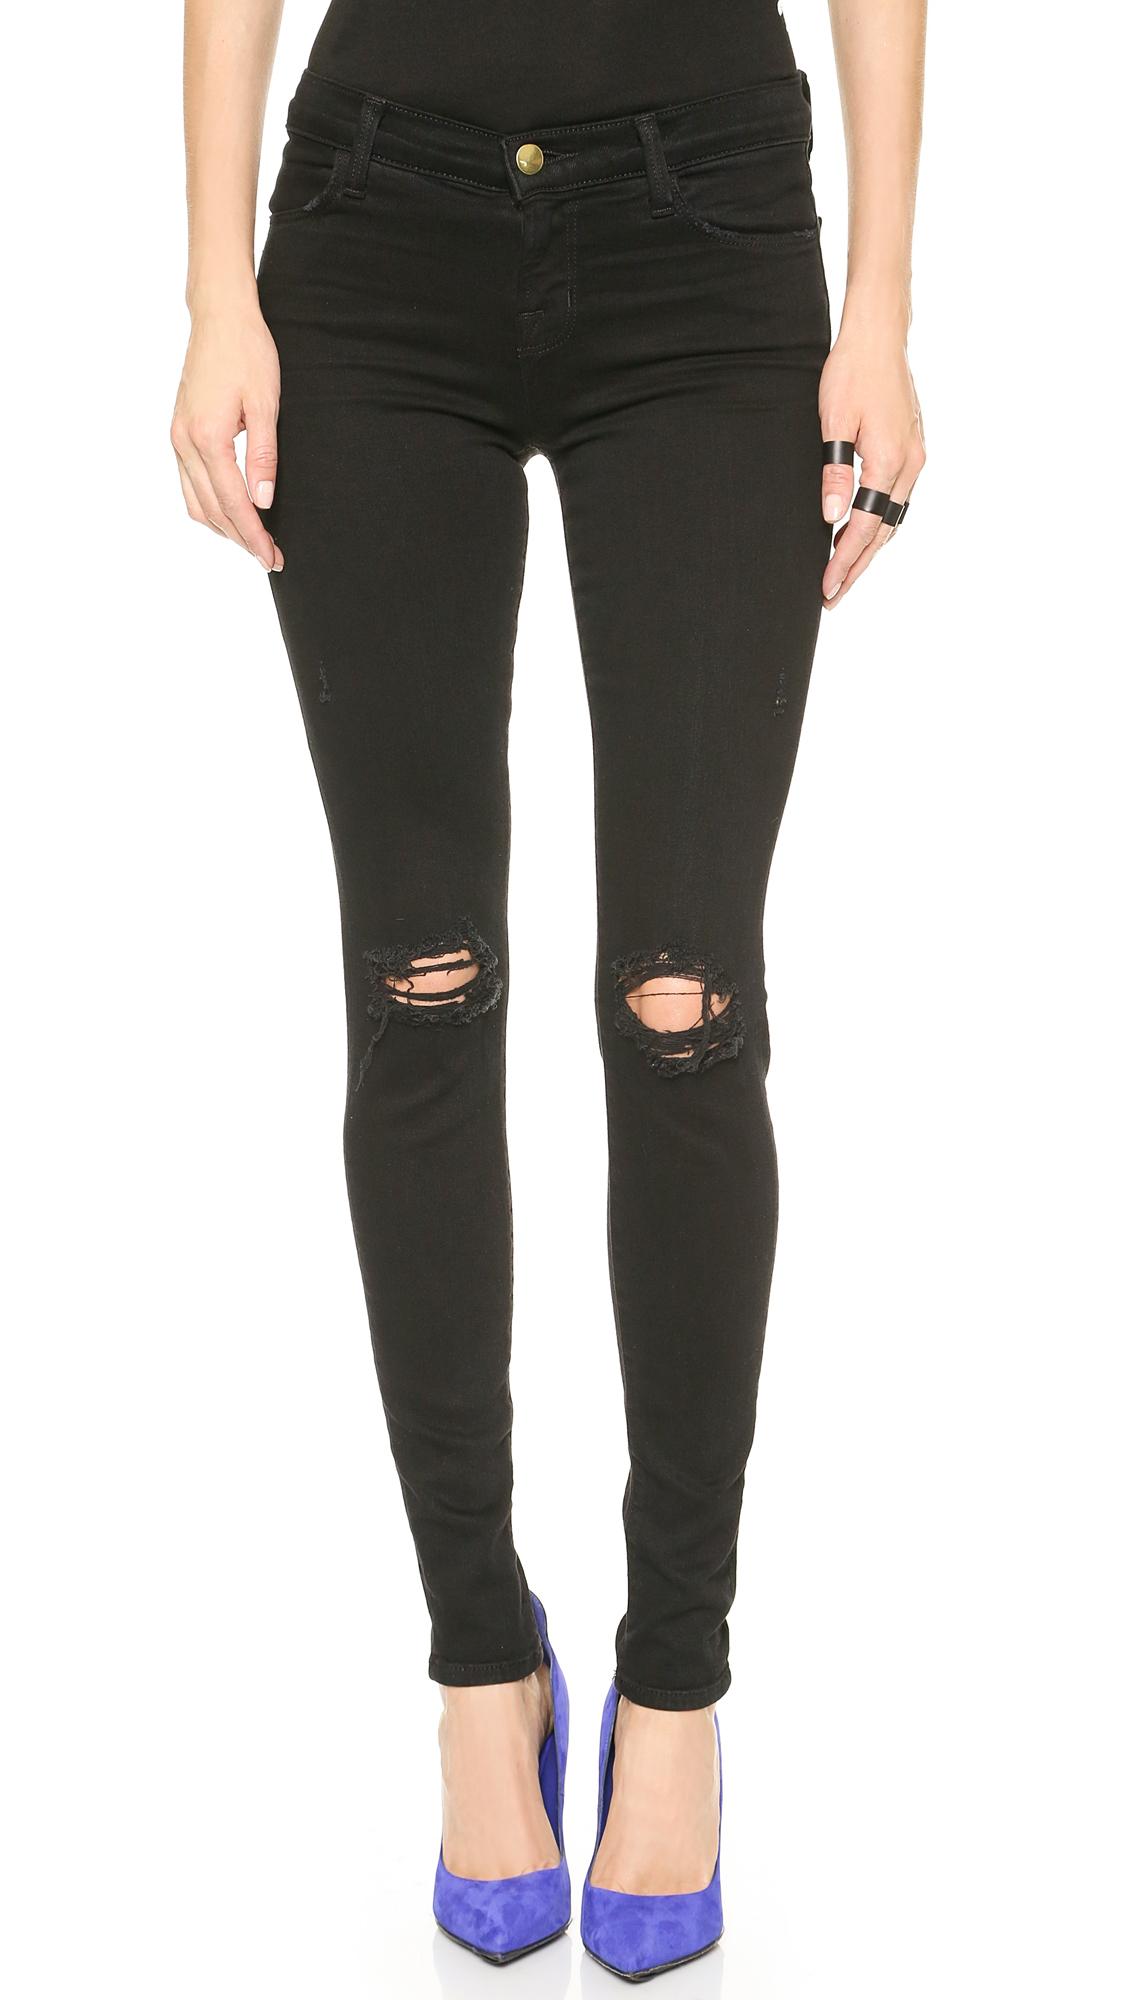 J brand ripped black skinny jeans